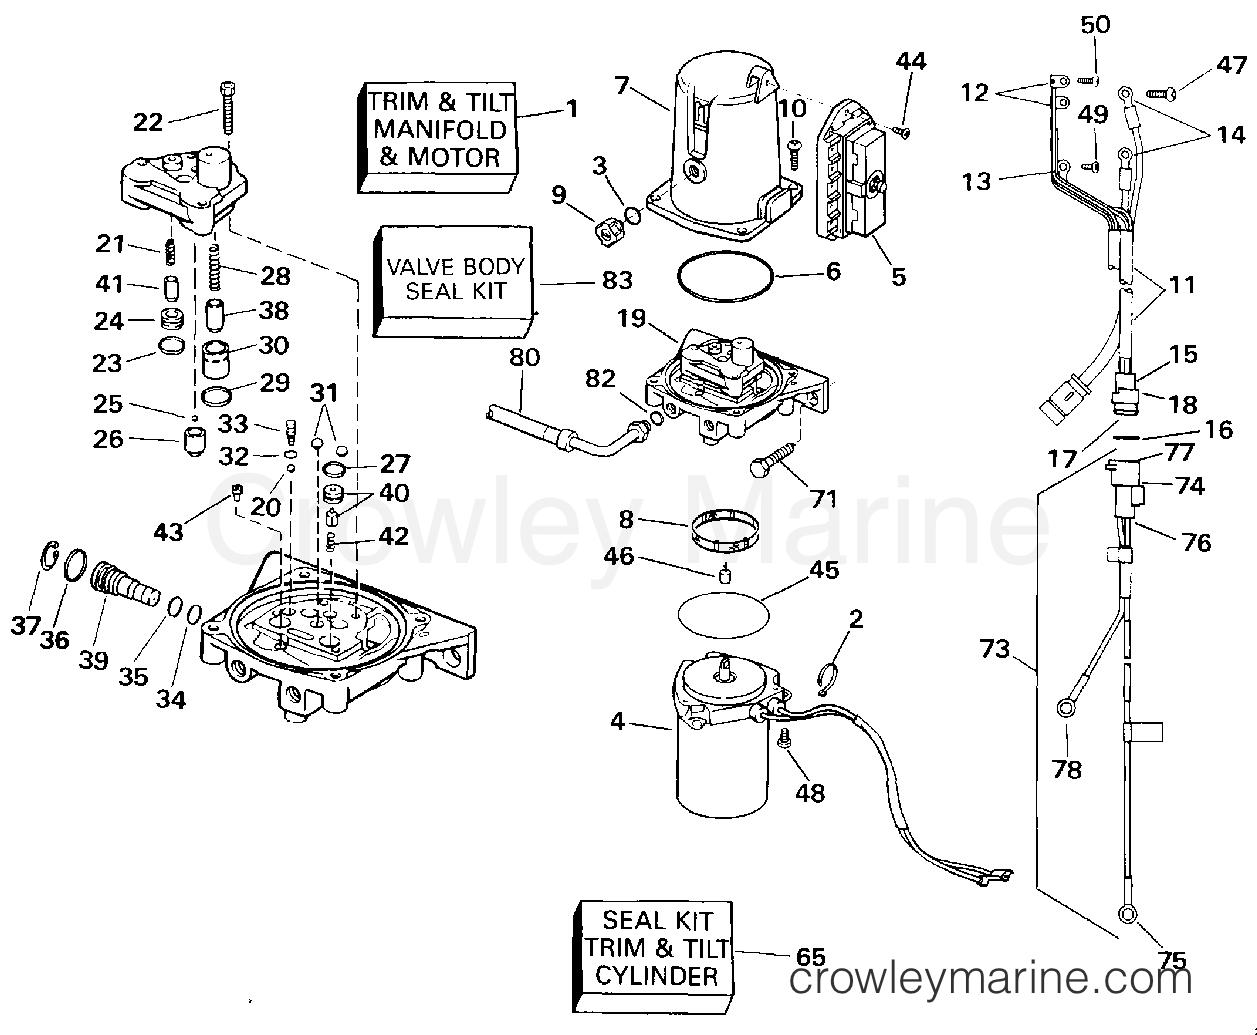 1994 OMC Stern Drive 5.8 - 58FAGPMDM - POWER TRIM AND TILT